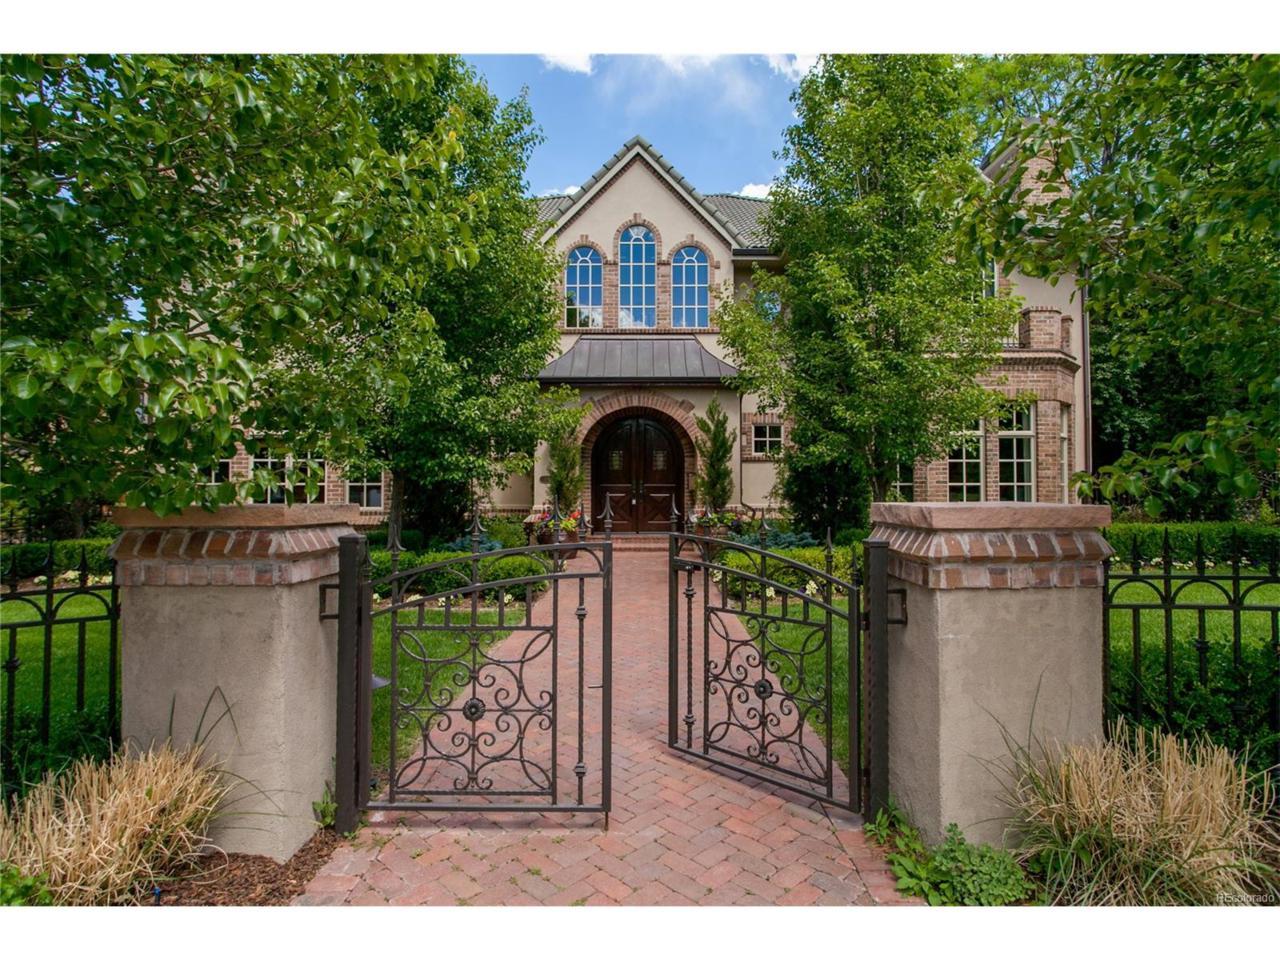 350 Eudora Street, Denver, CO 80220 (MLS #1572775) :: 8z Real Estate